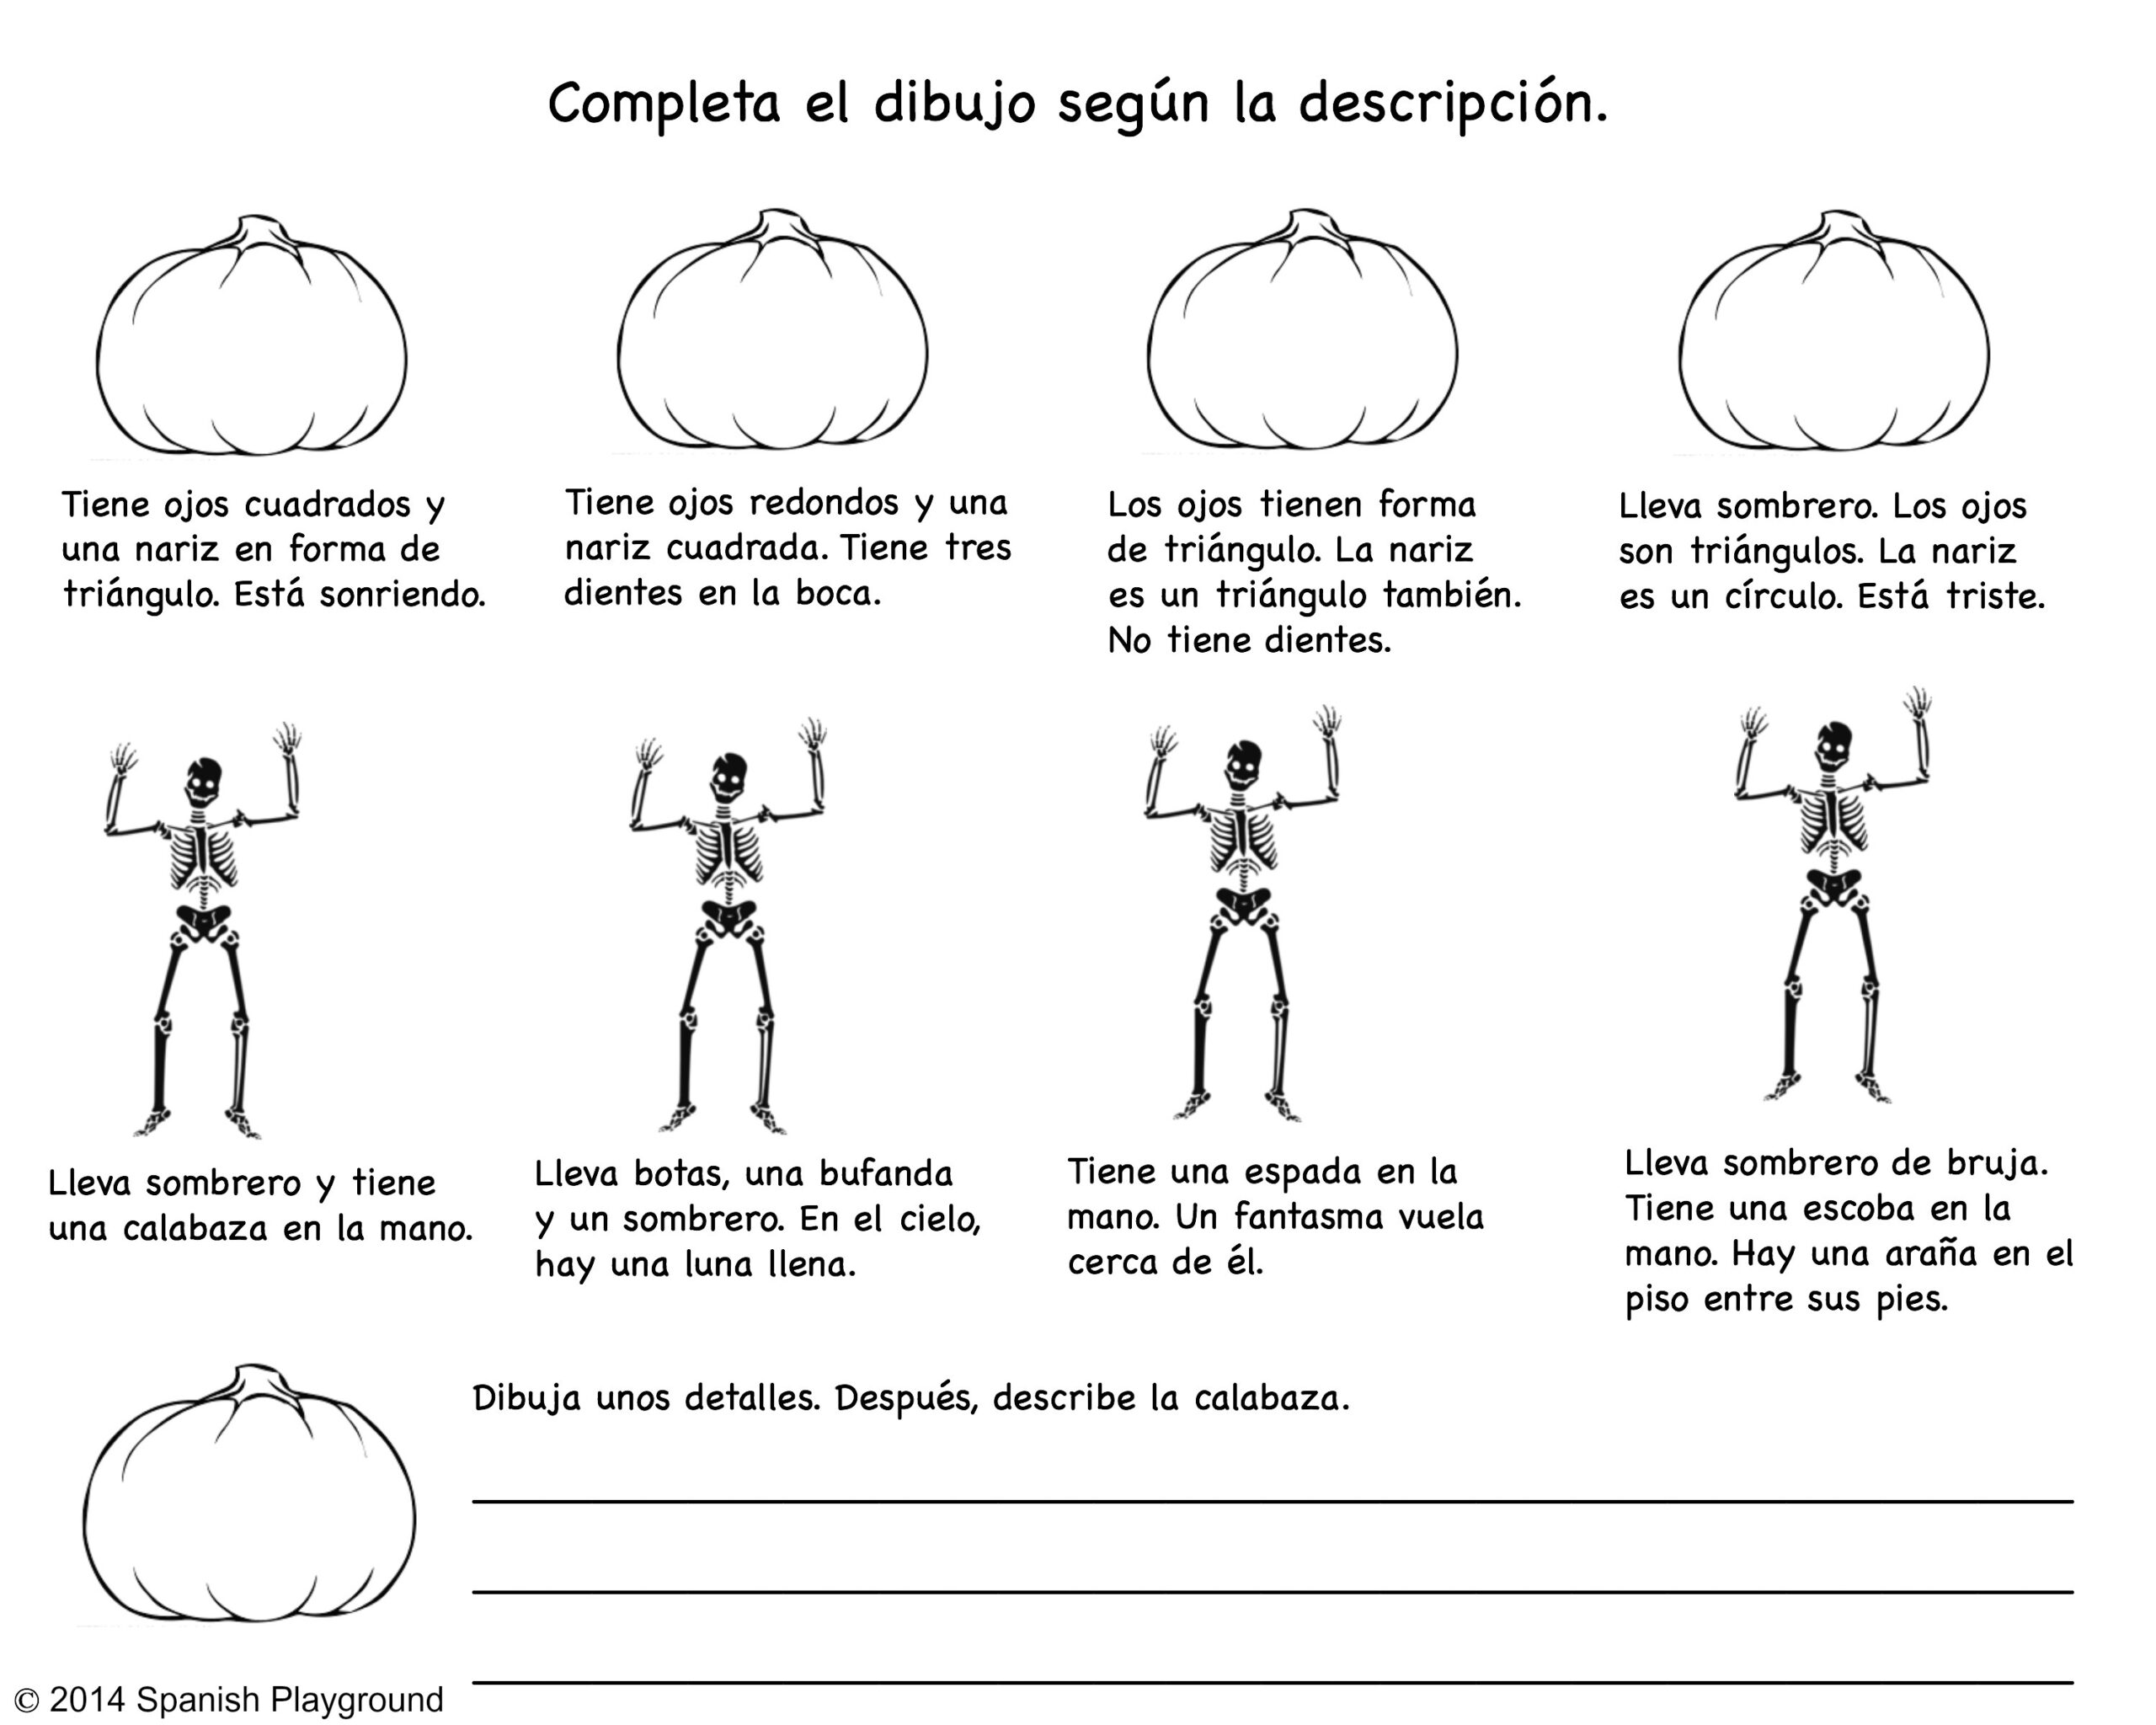 Spanish Halloween Read-And-Draw Printable - Spanish Playground